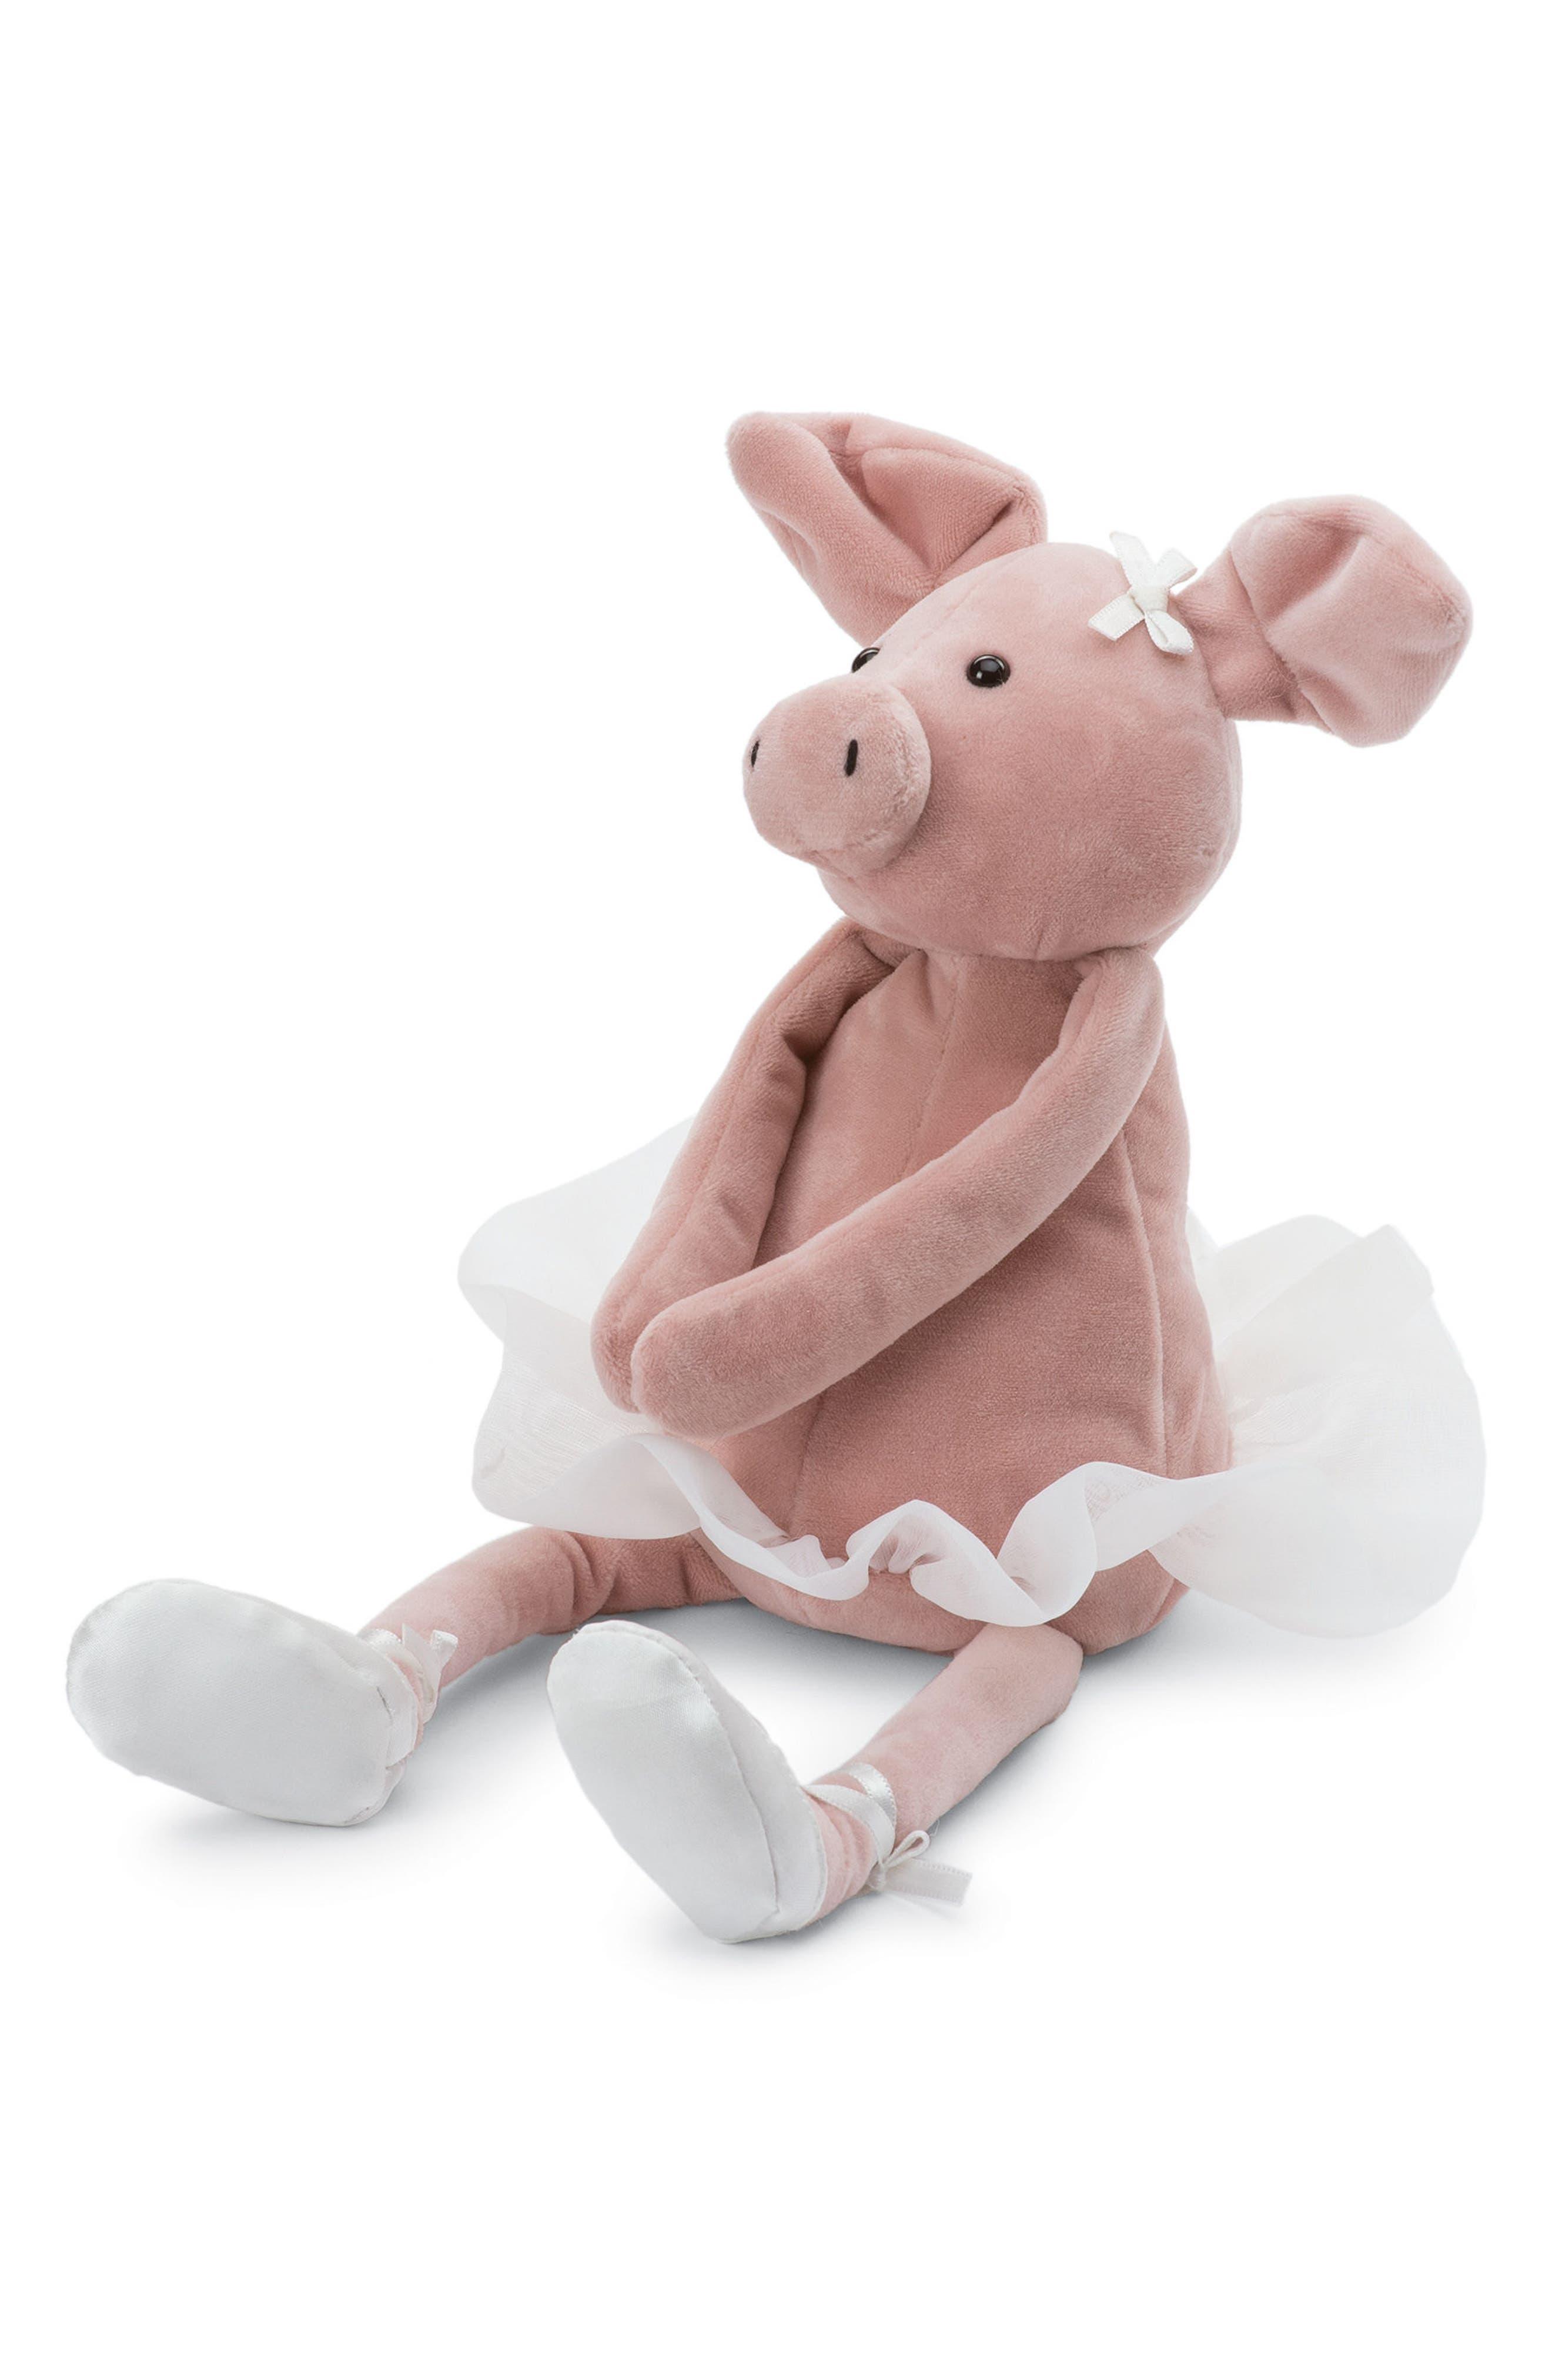 Dancing Darcey Piglet Stuffed Animal,                             Main thumbnail 1, color,                             Pink